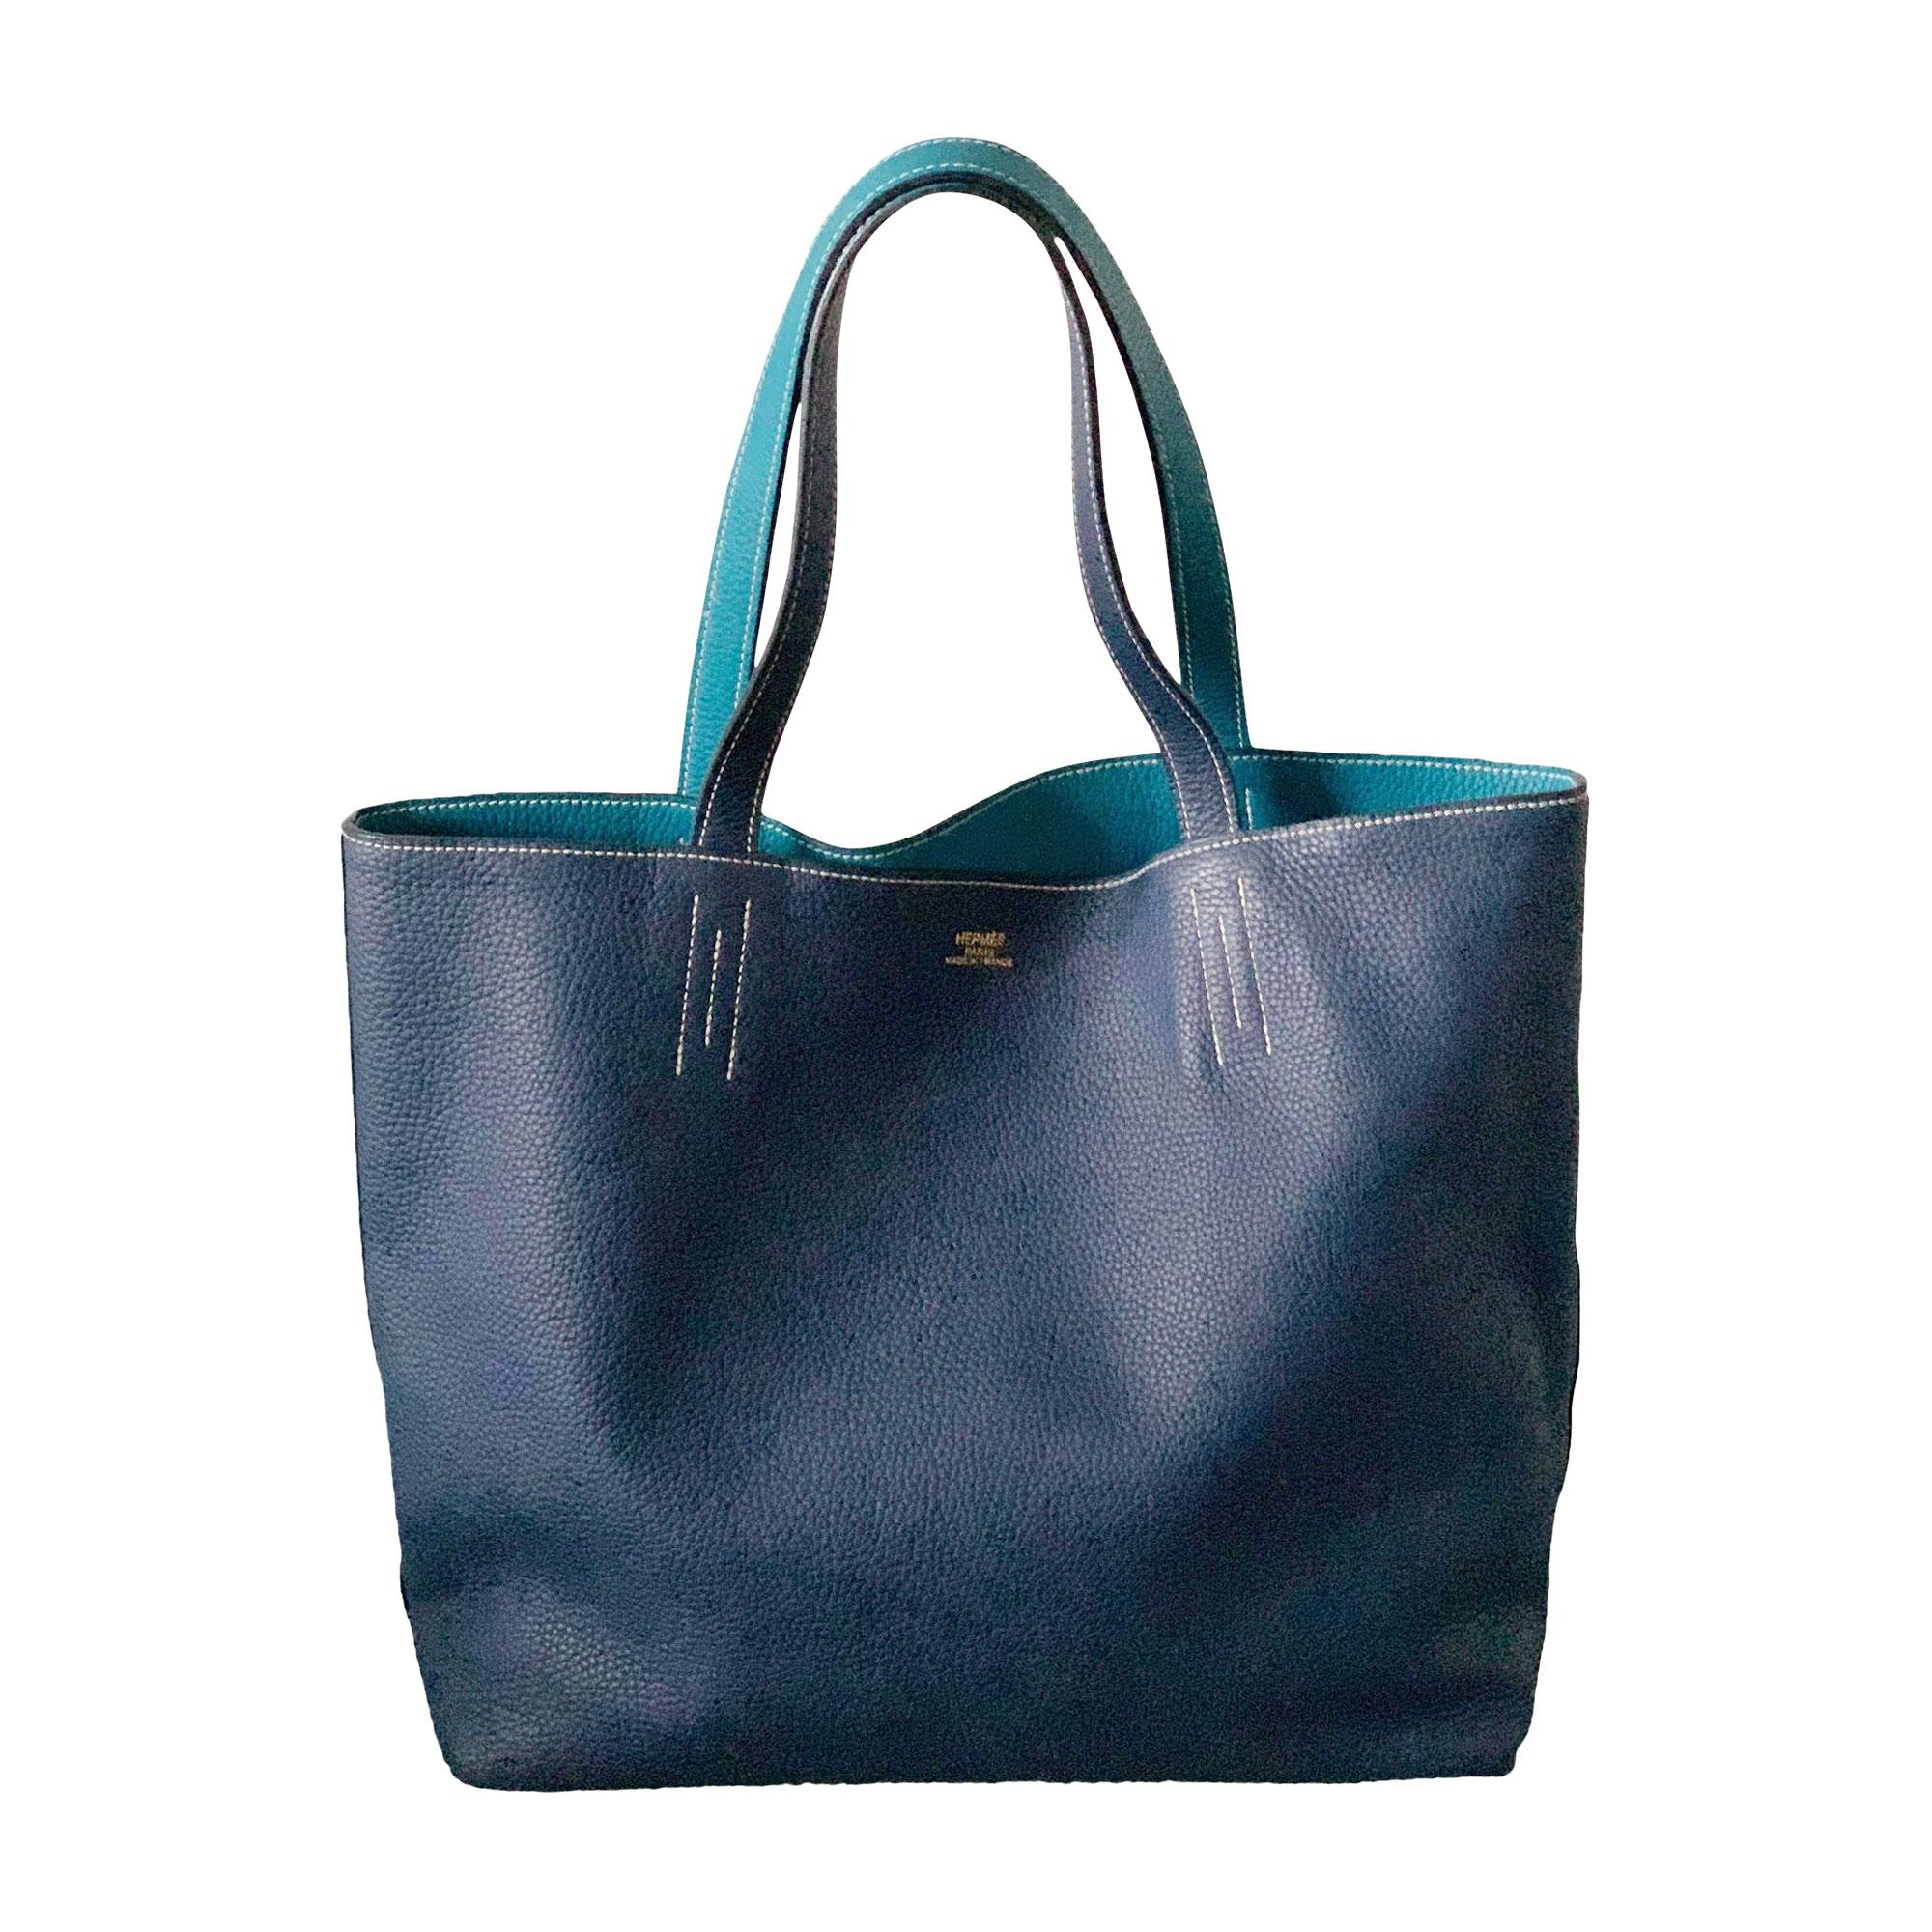 Sac XL en cuir HERMÈS Bleu, bleu marine, bleu turquoise